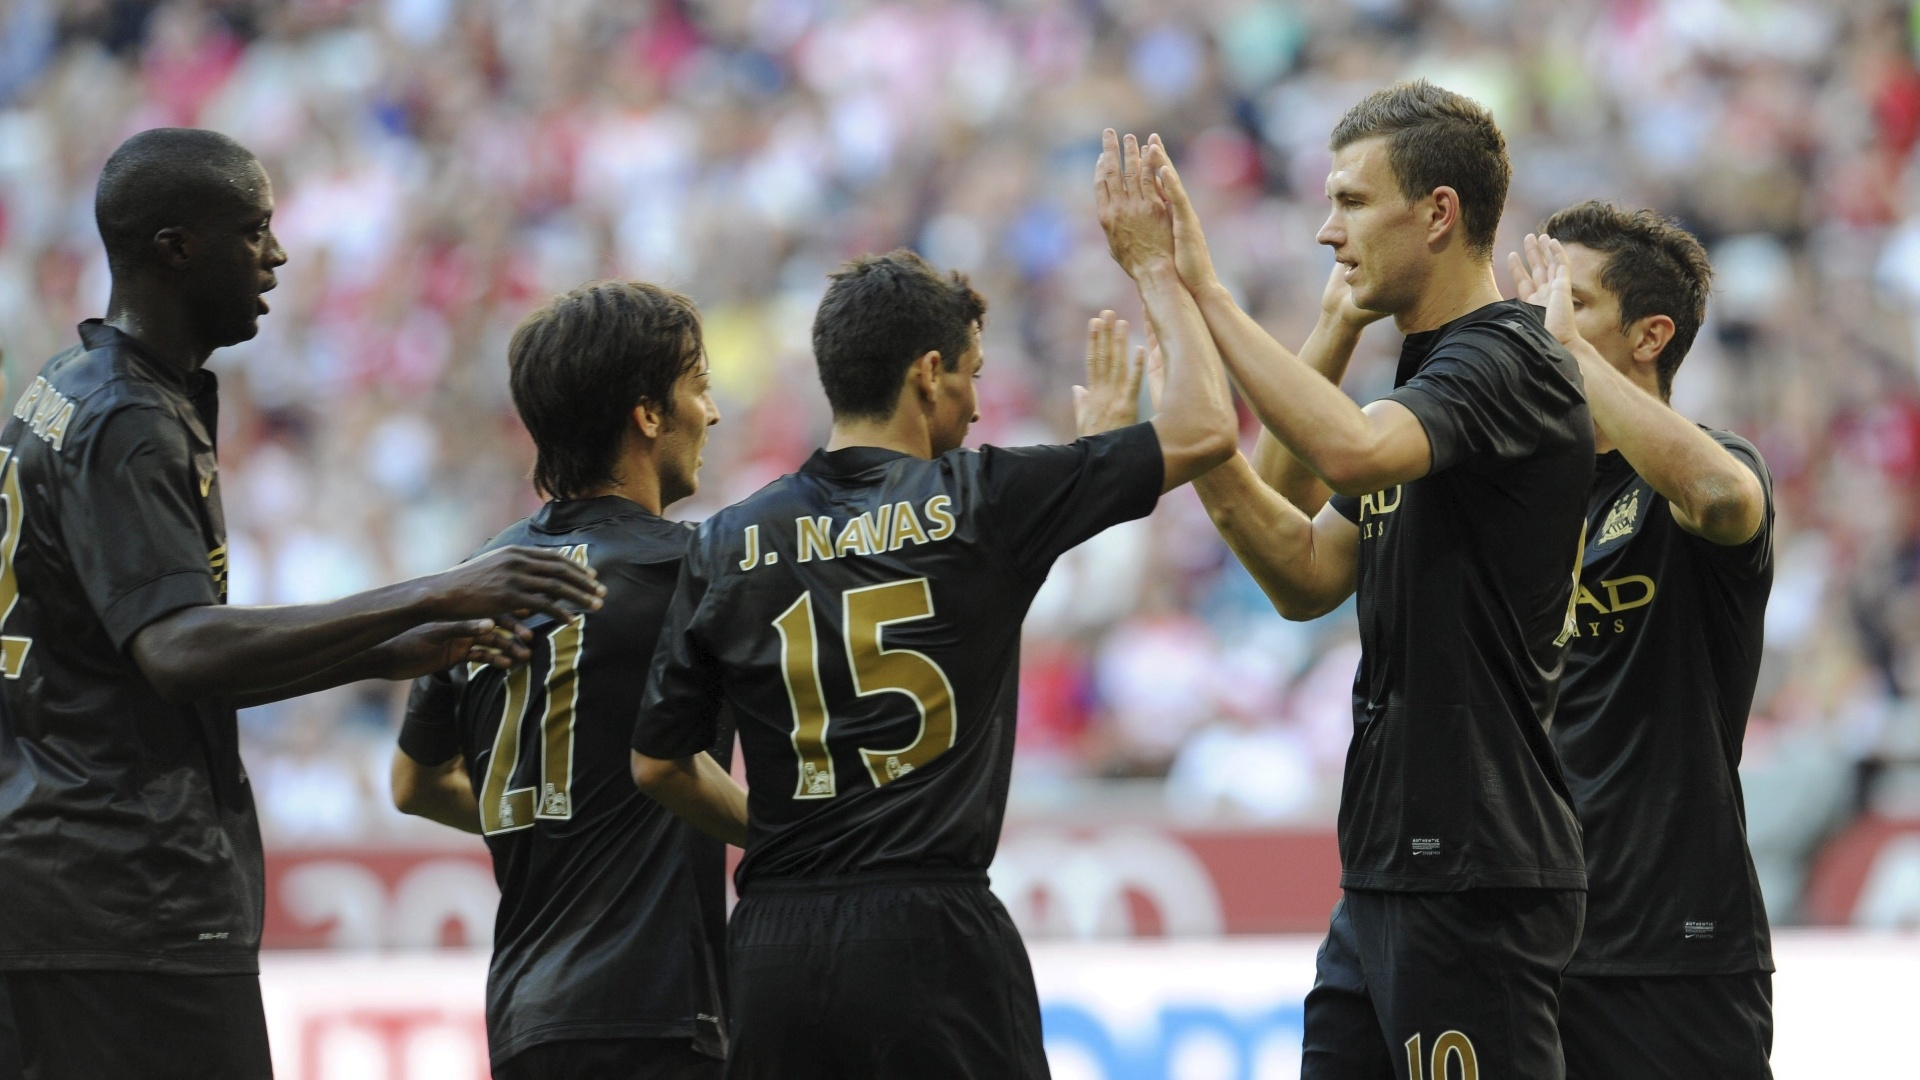 31.jul.2013 - Atacante Dzeko comemora com os companheiros seu gol pelo Manchester City contra o Milan na Audi Cup